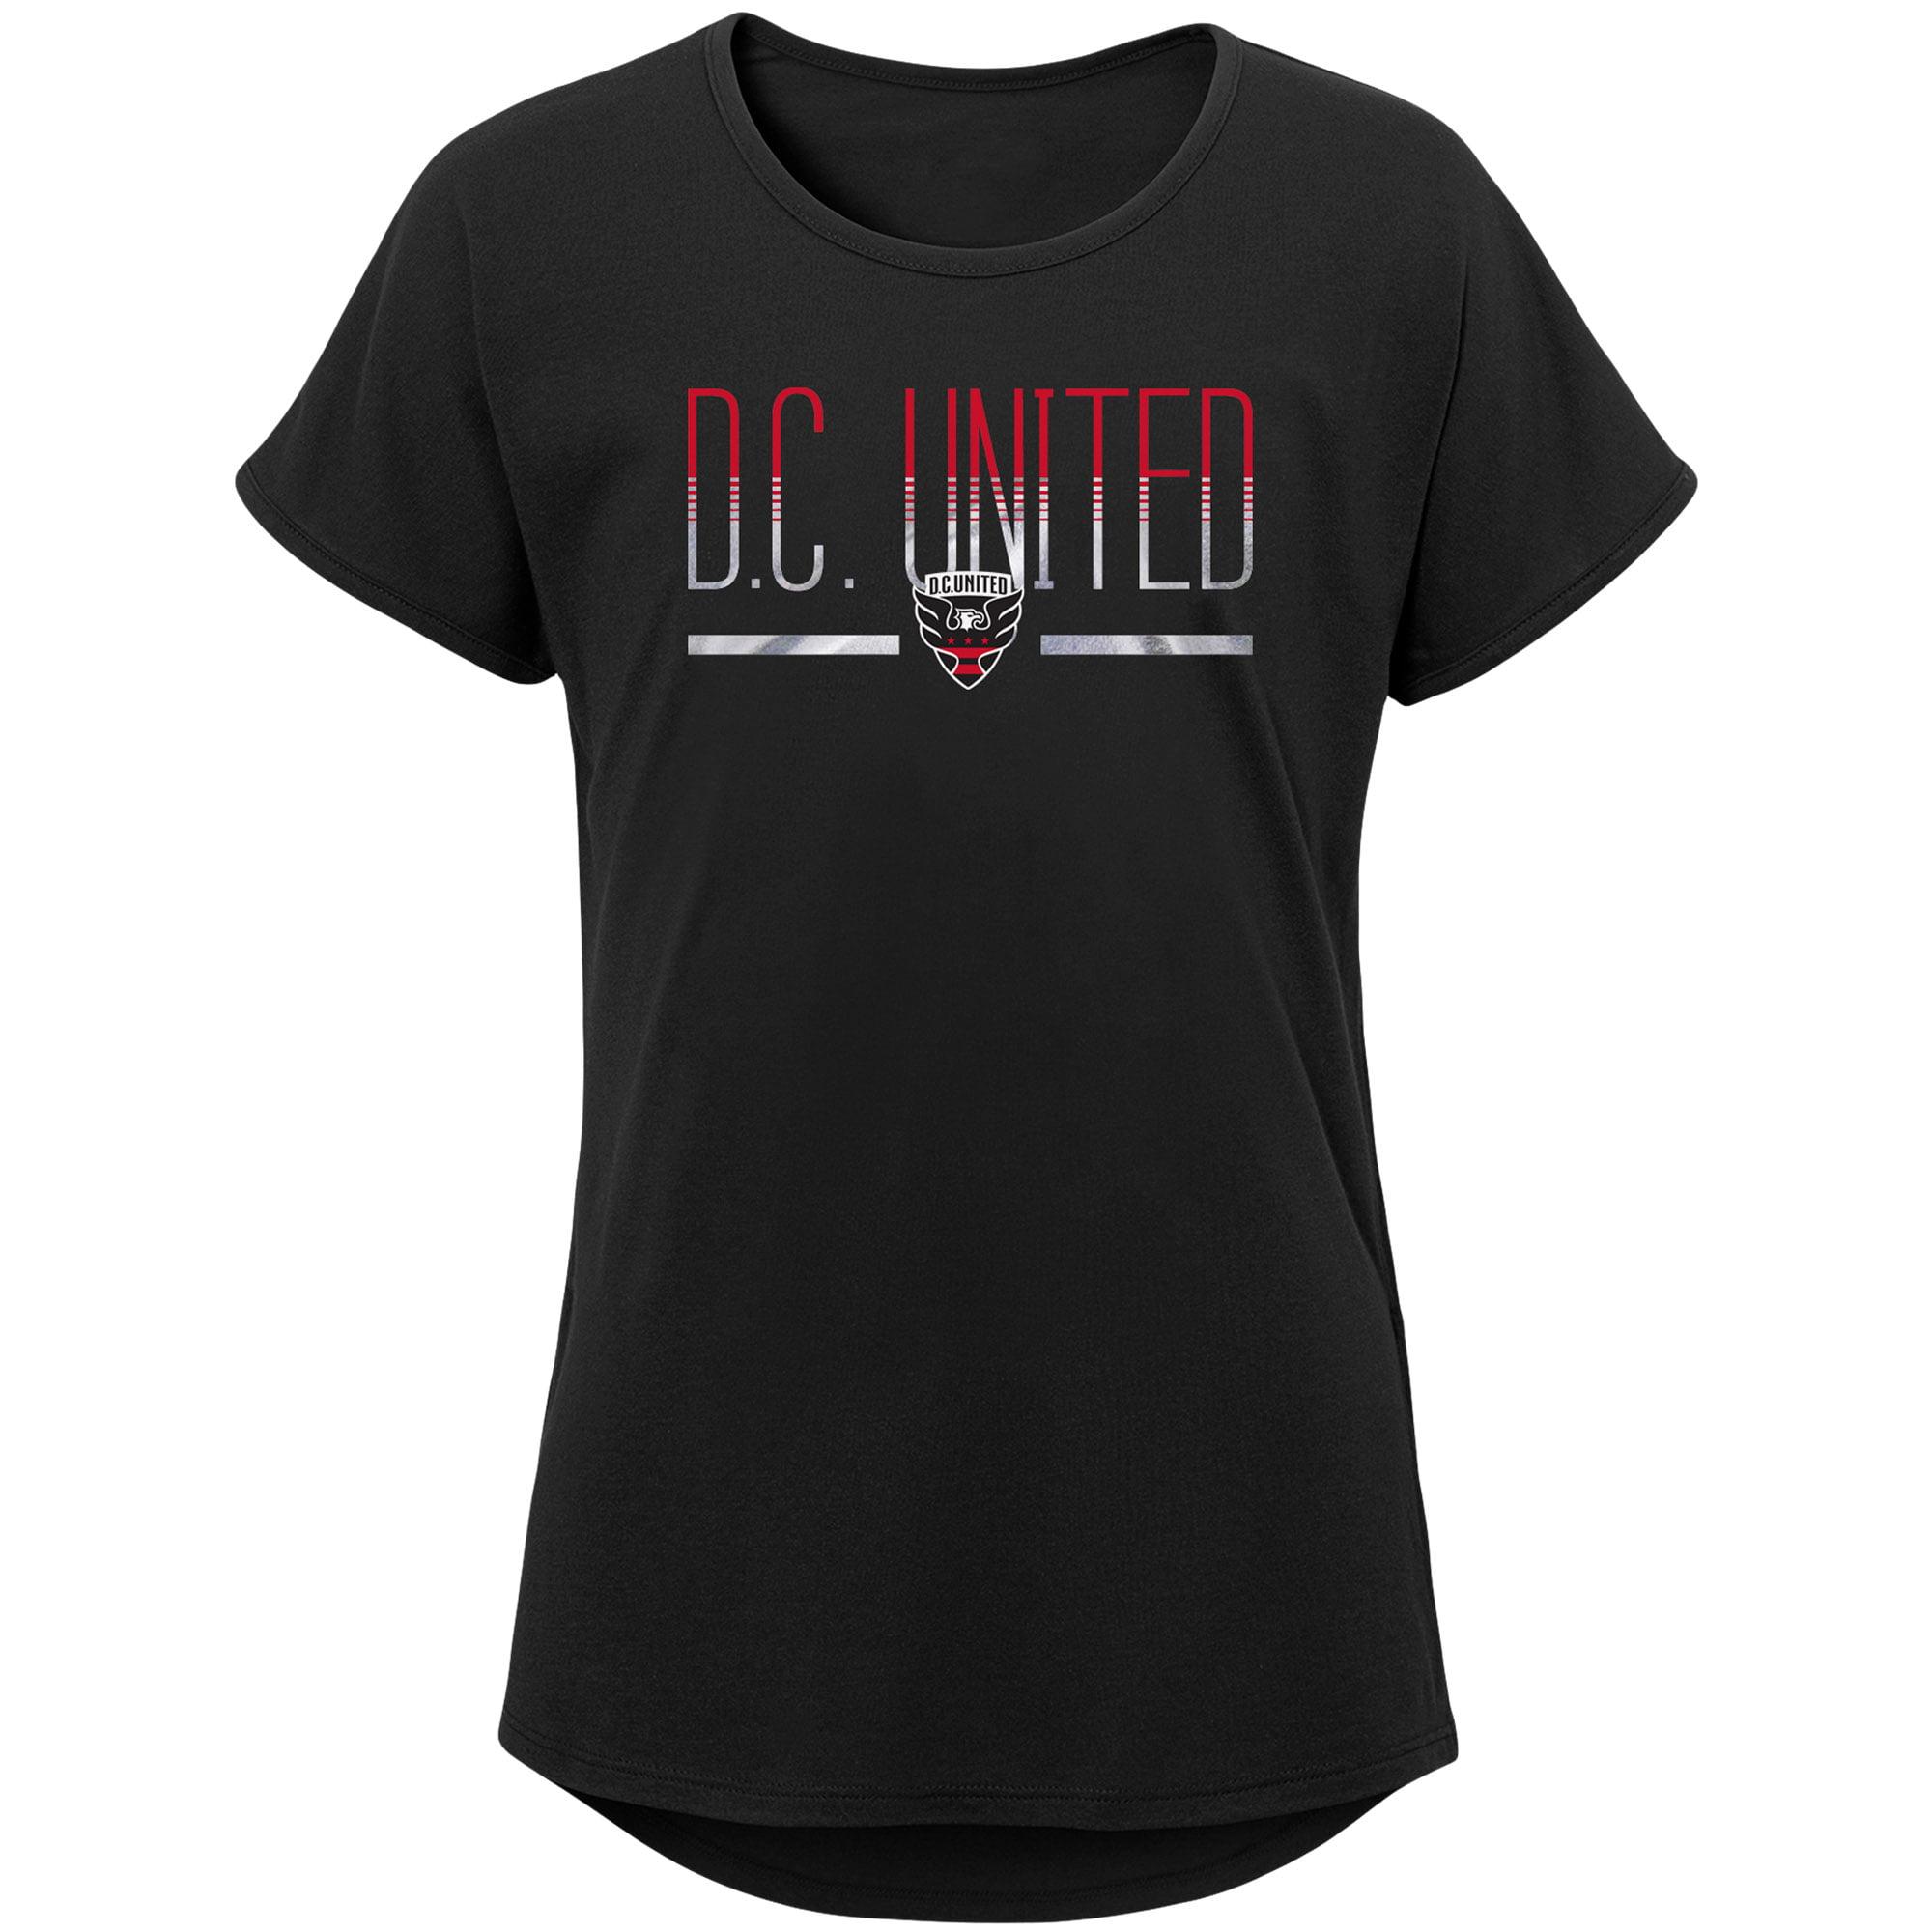 D.C. United Girls Youth Glory Dolman T-Shirt - Black